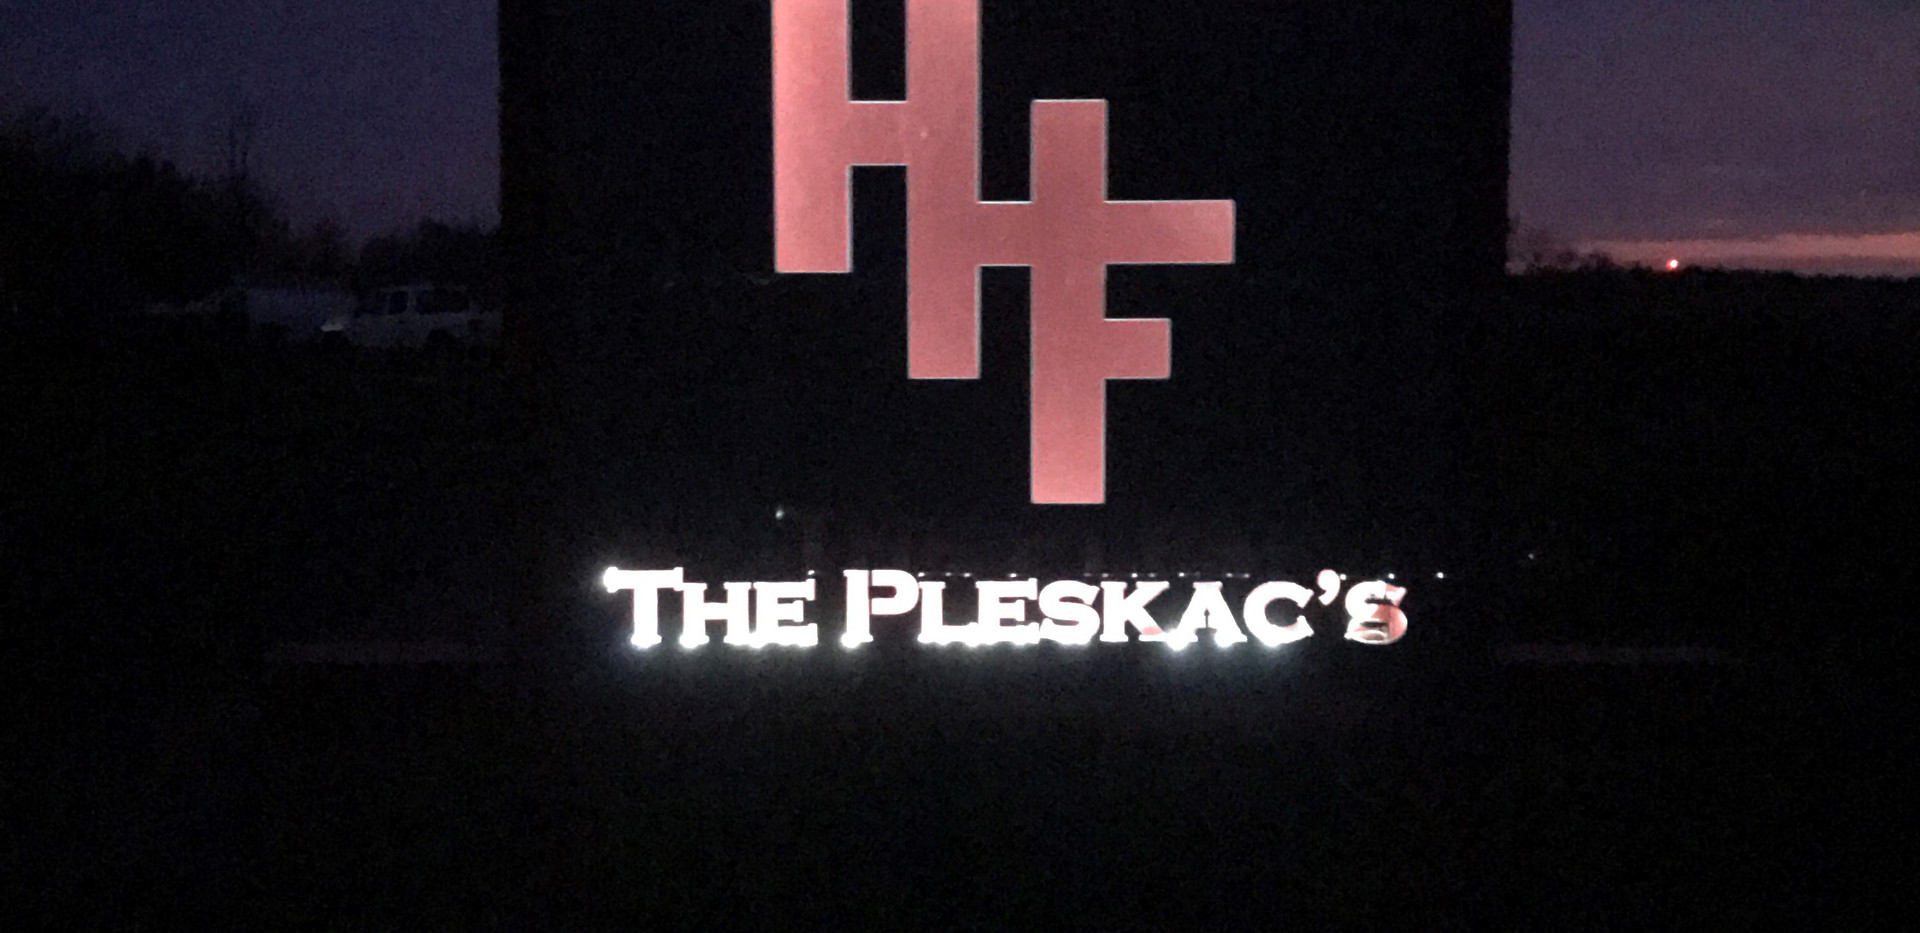 HHF sign.jpg